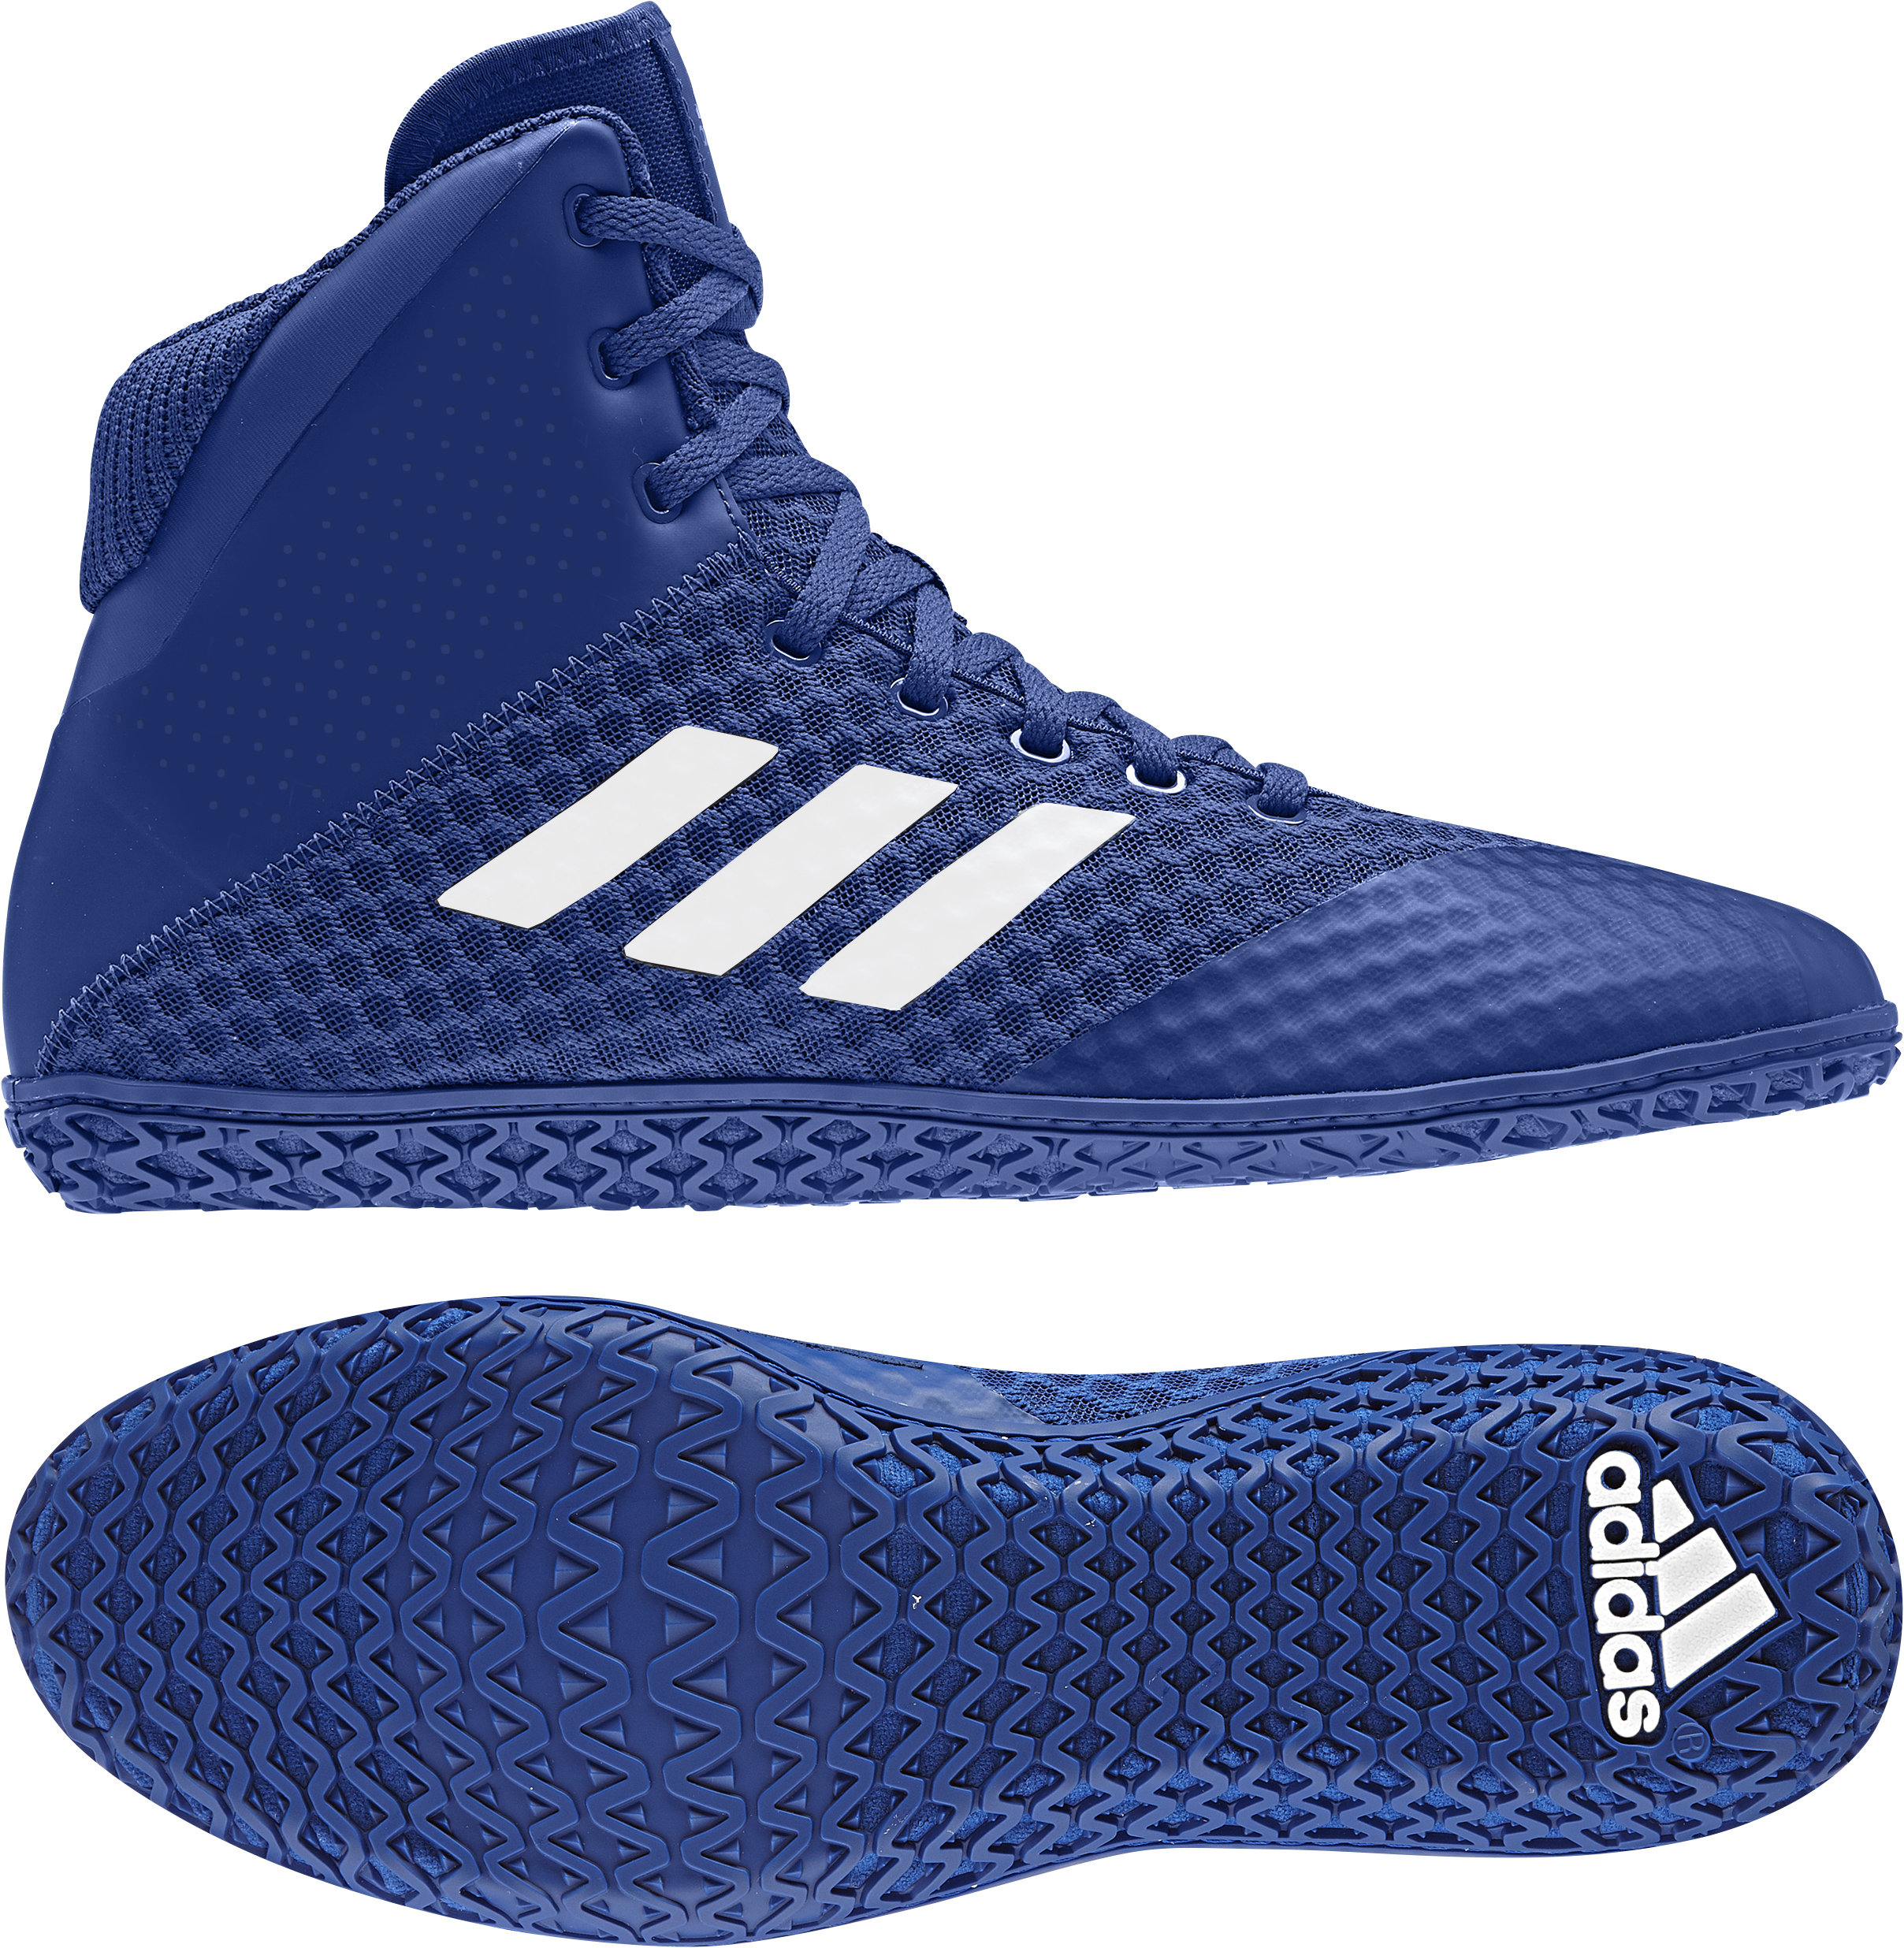 Mat Wizard Wrestling Shoe 00017